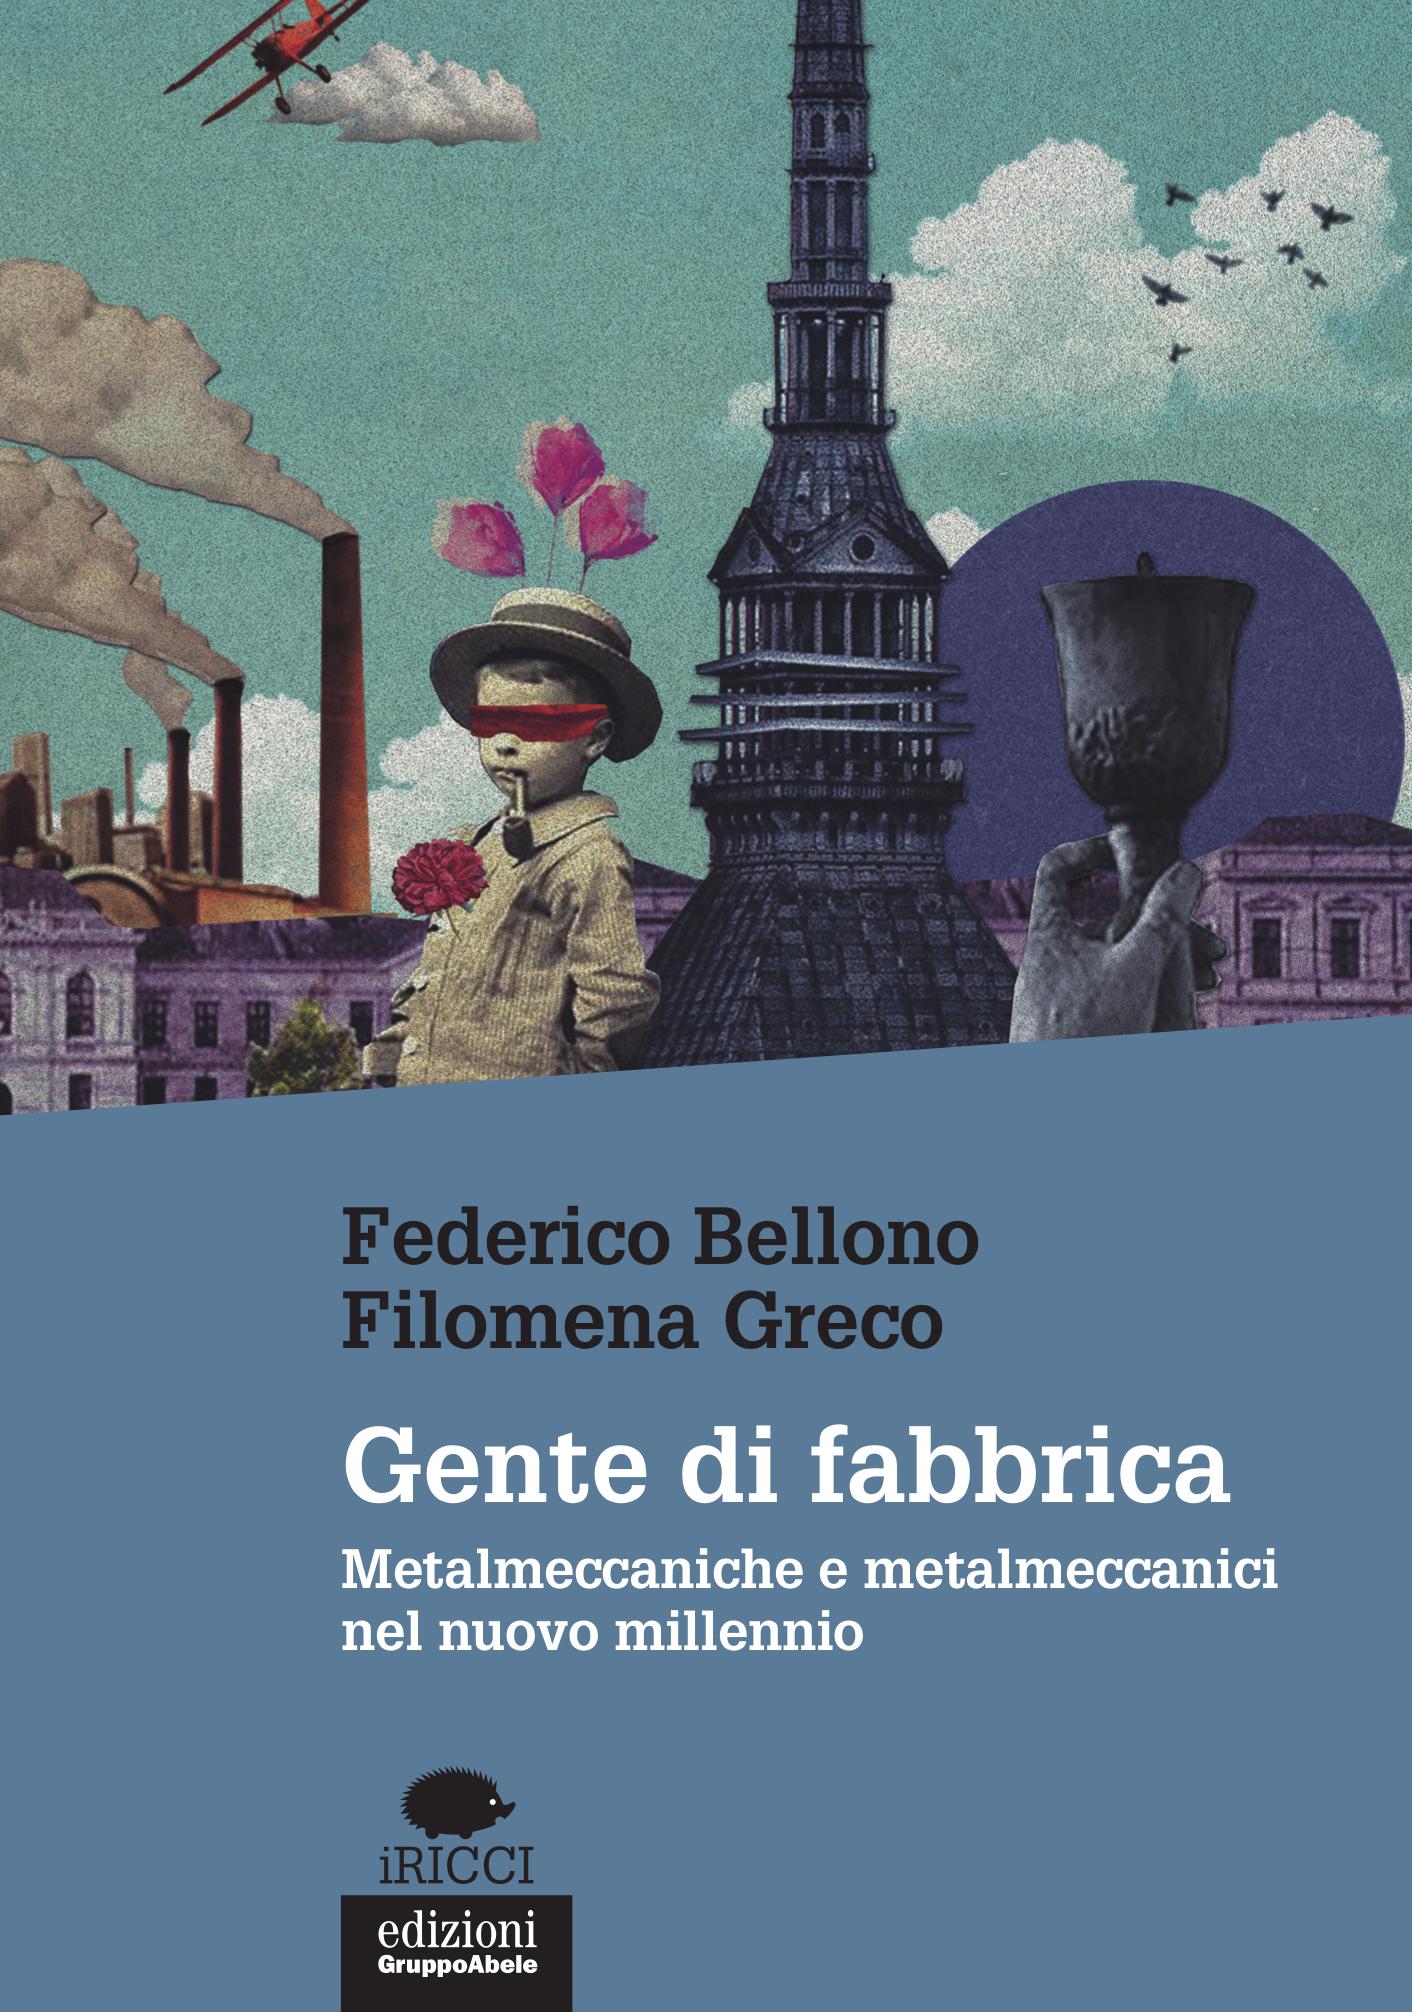 Gente_fabbrica_cover2 (1)